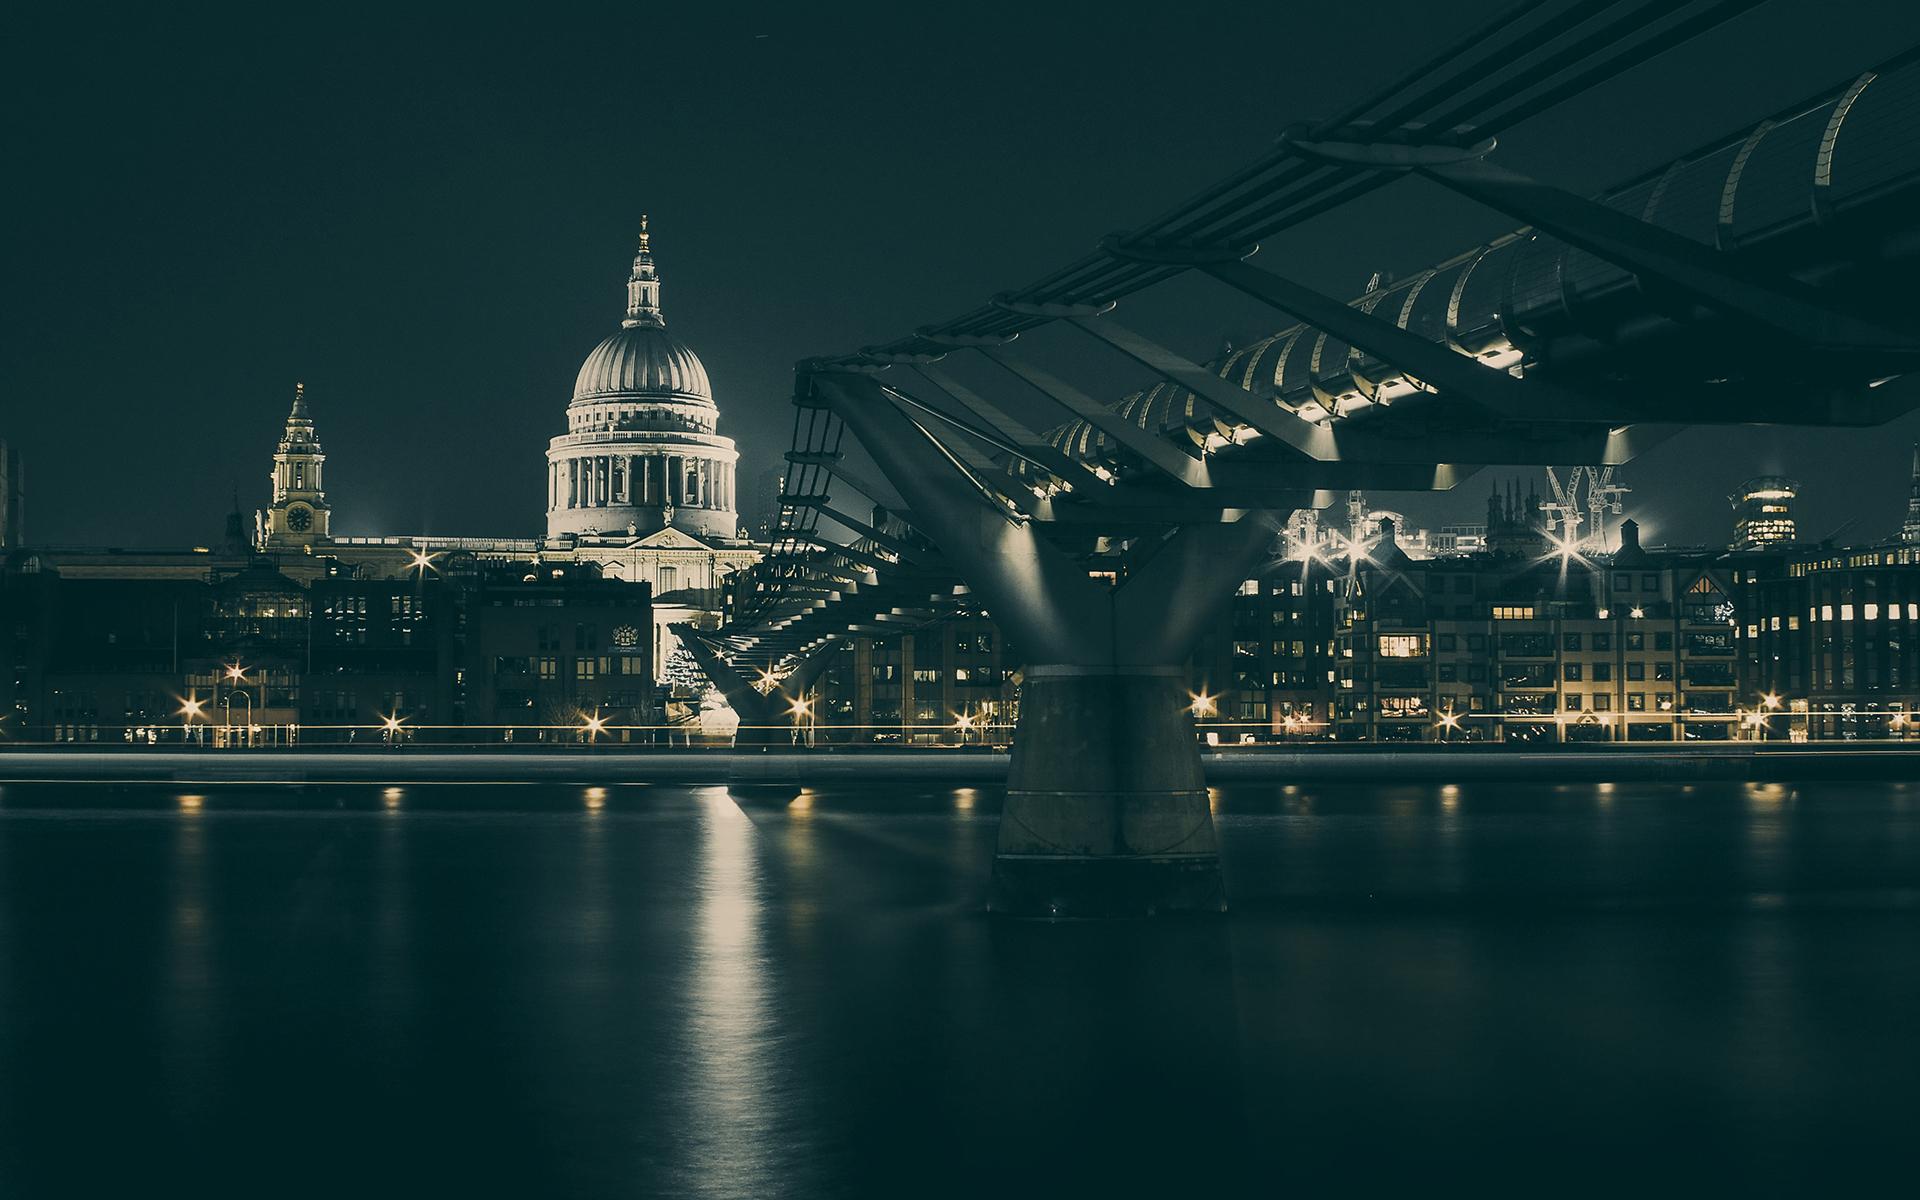 London St Pauls